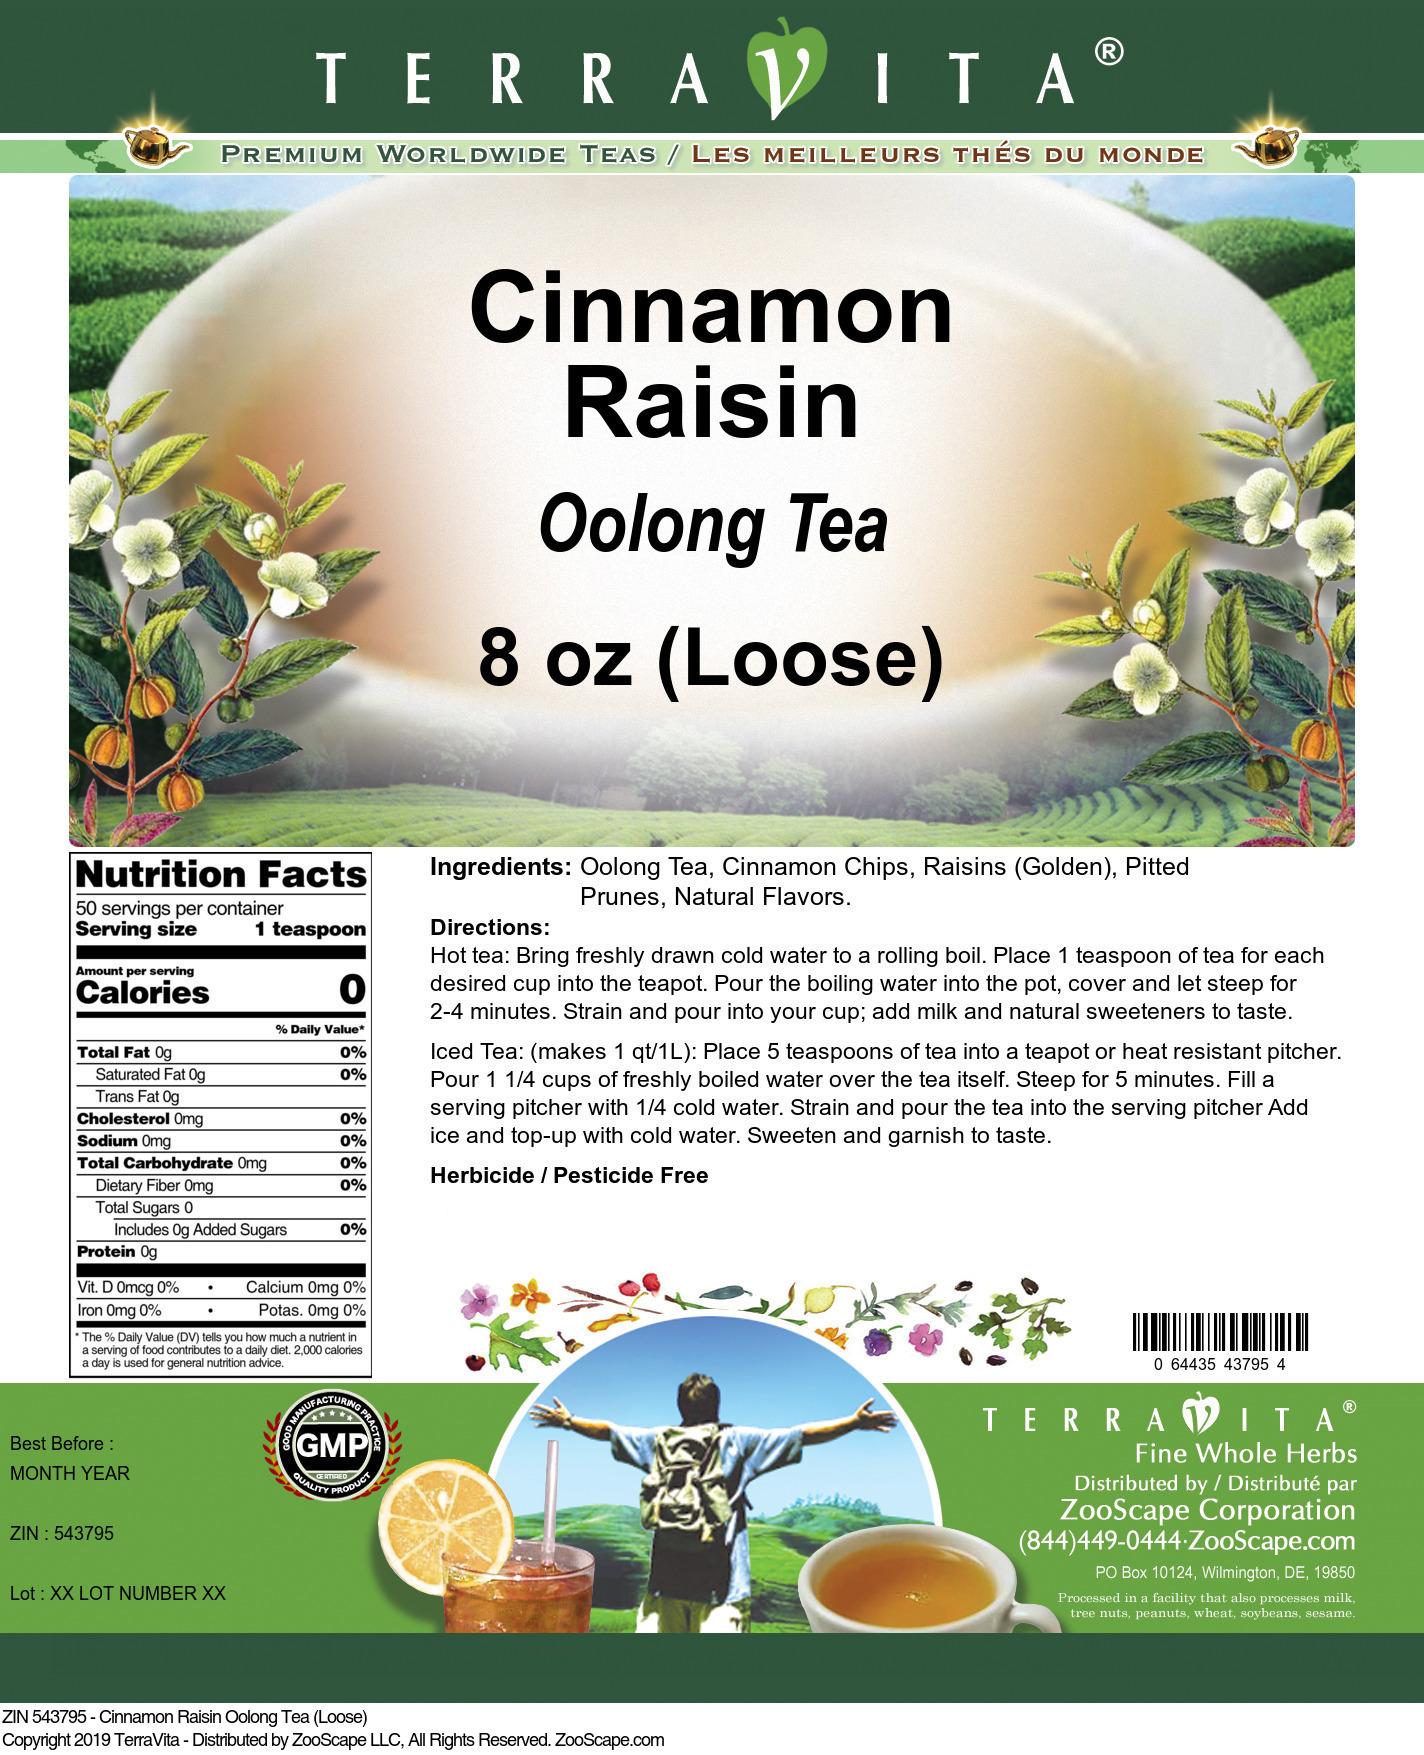 Cinnamon Raisin Oolong Tea (Loose)